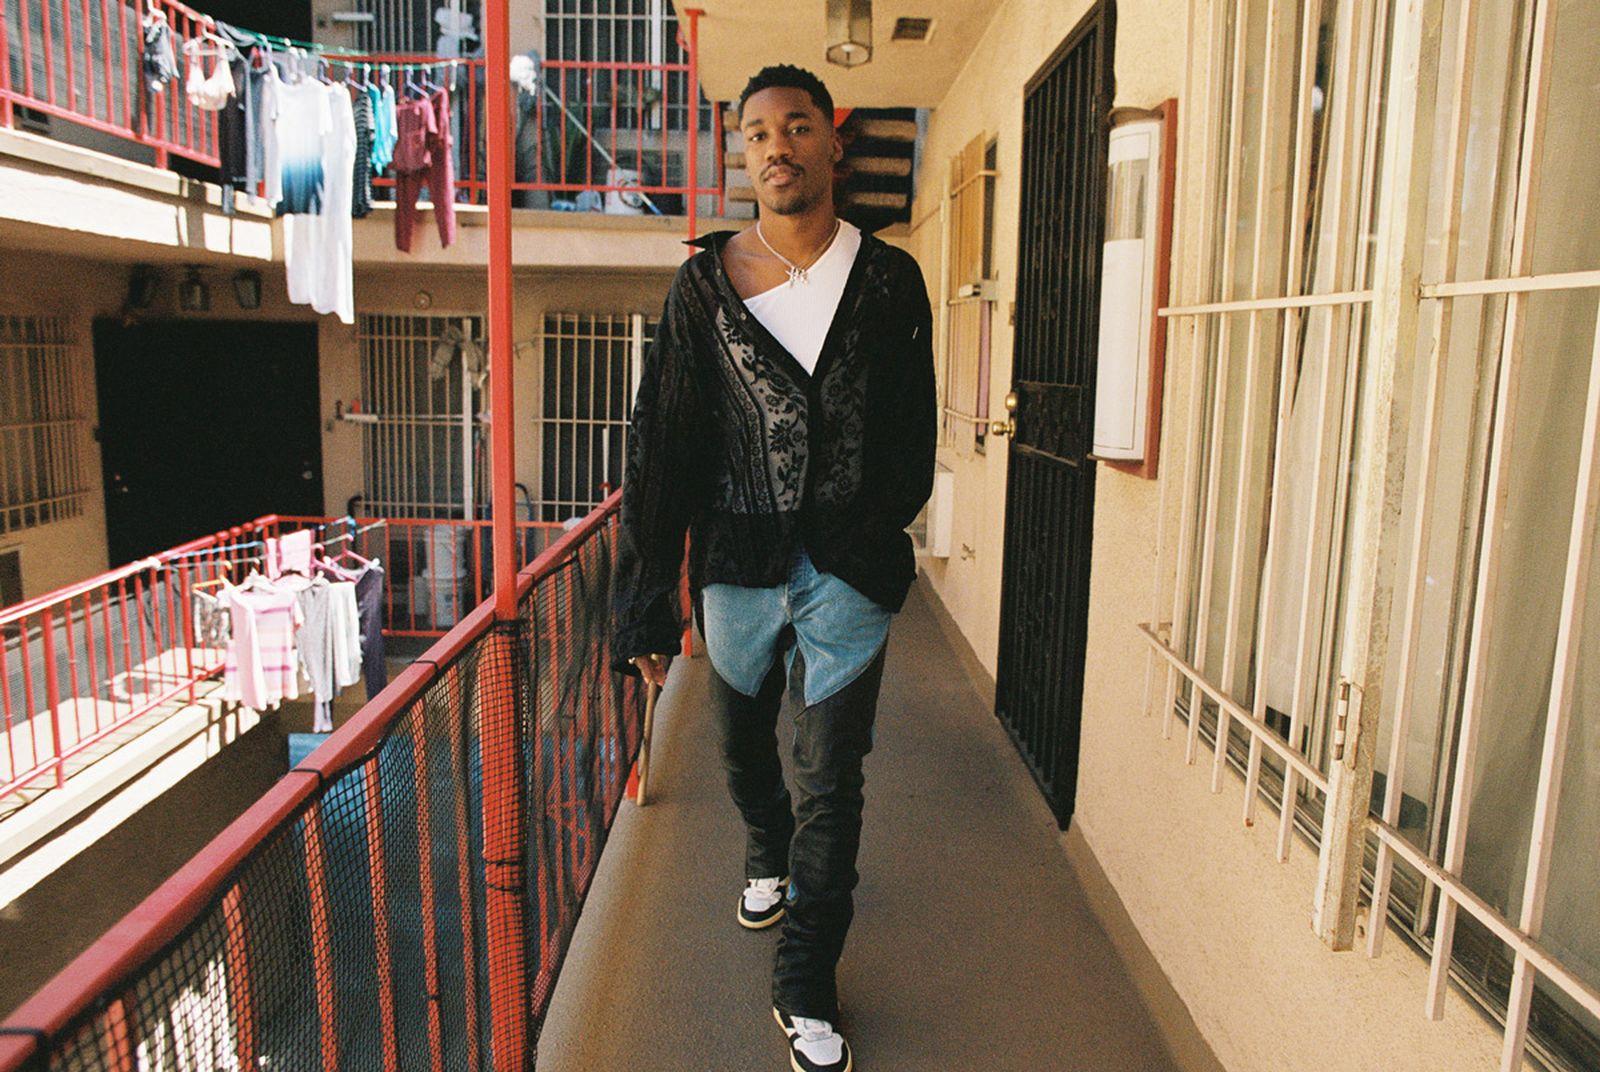 Shirt NOON GOONS Pants and jeans RHUDE tank SPENCER BADU